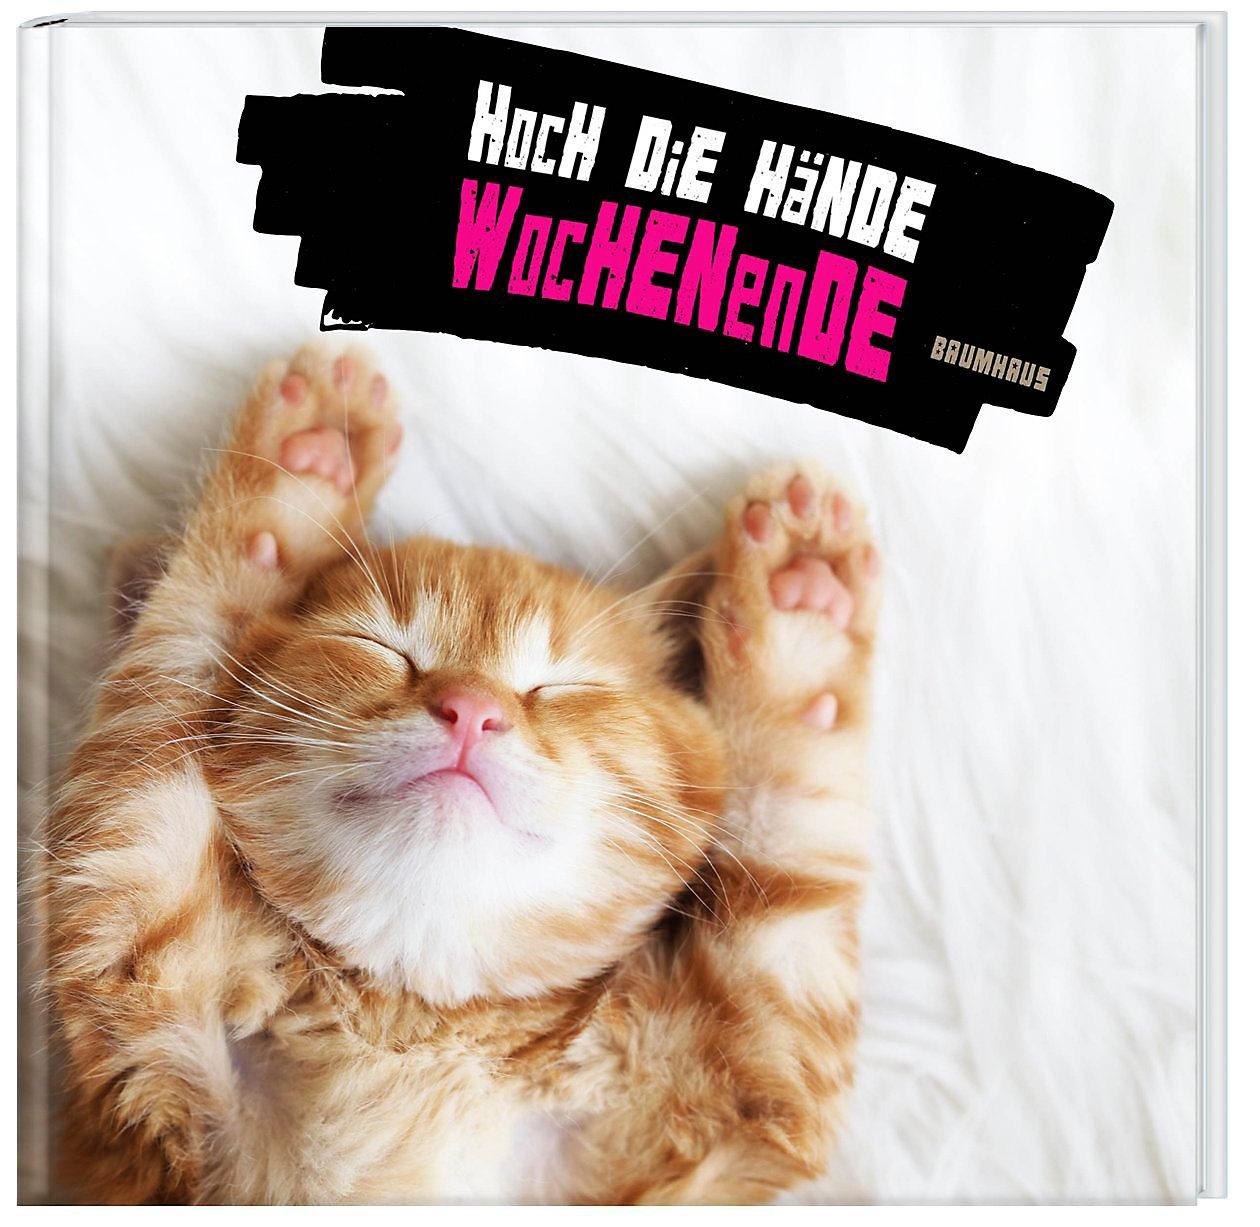 Katze Wochenende